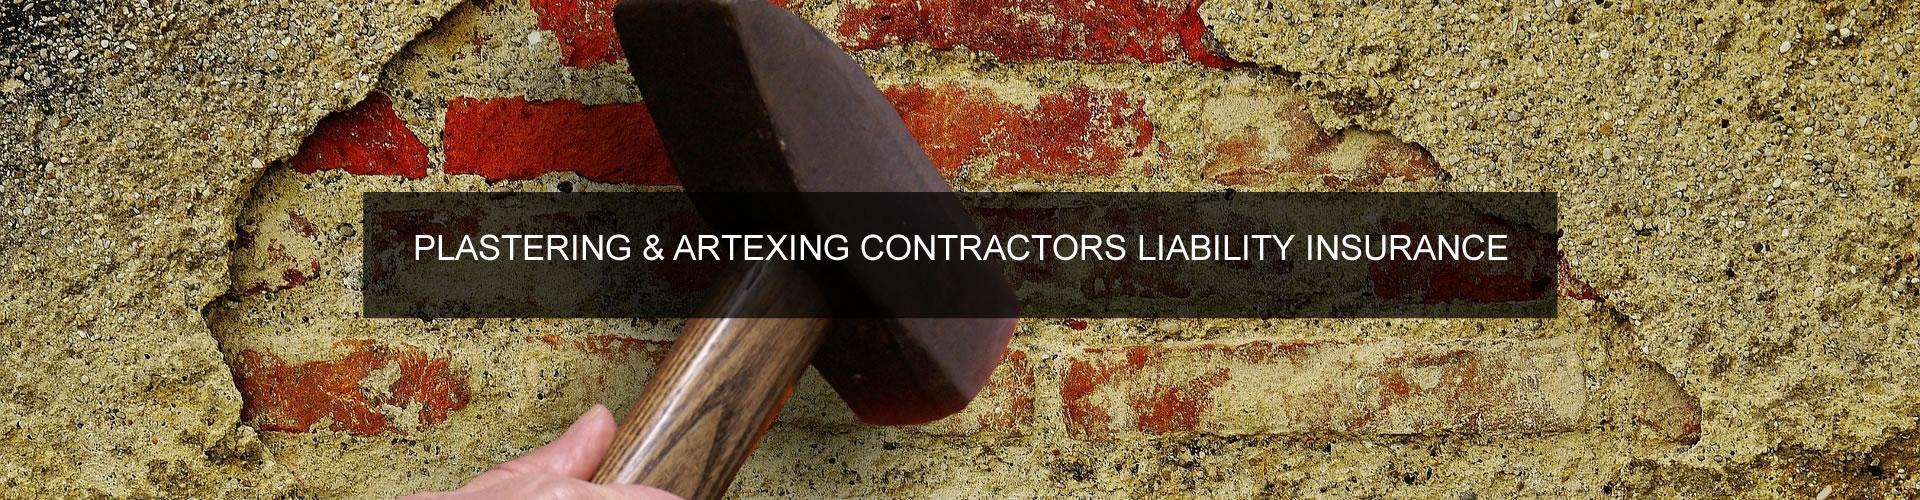 Plastering Contractors Liability Insurance